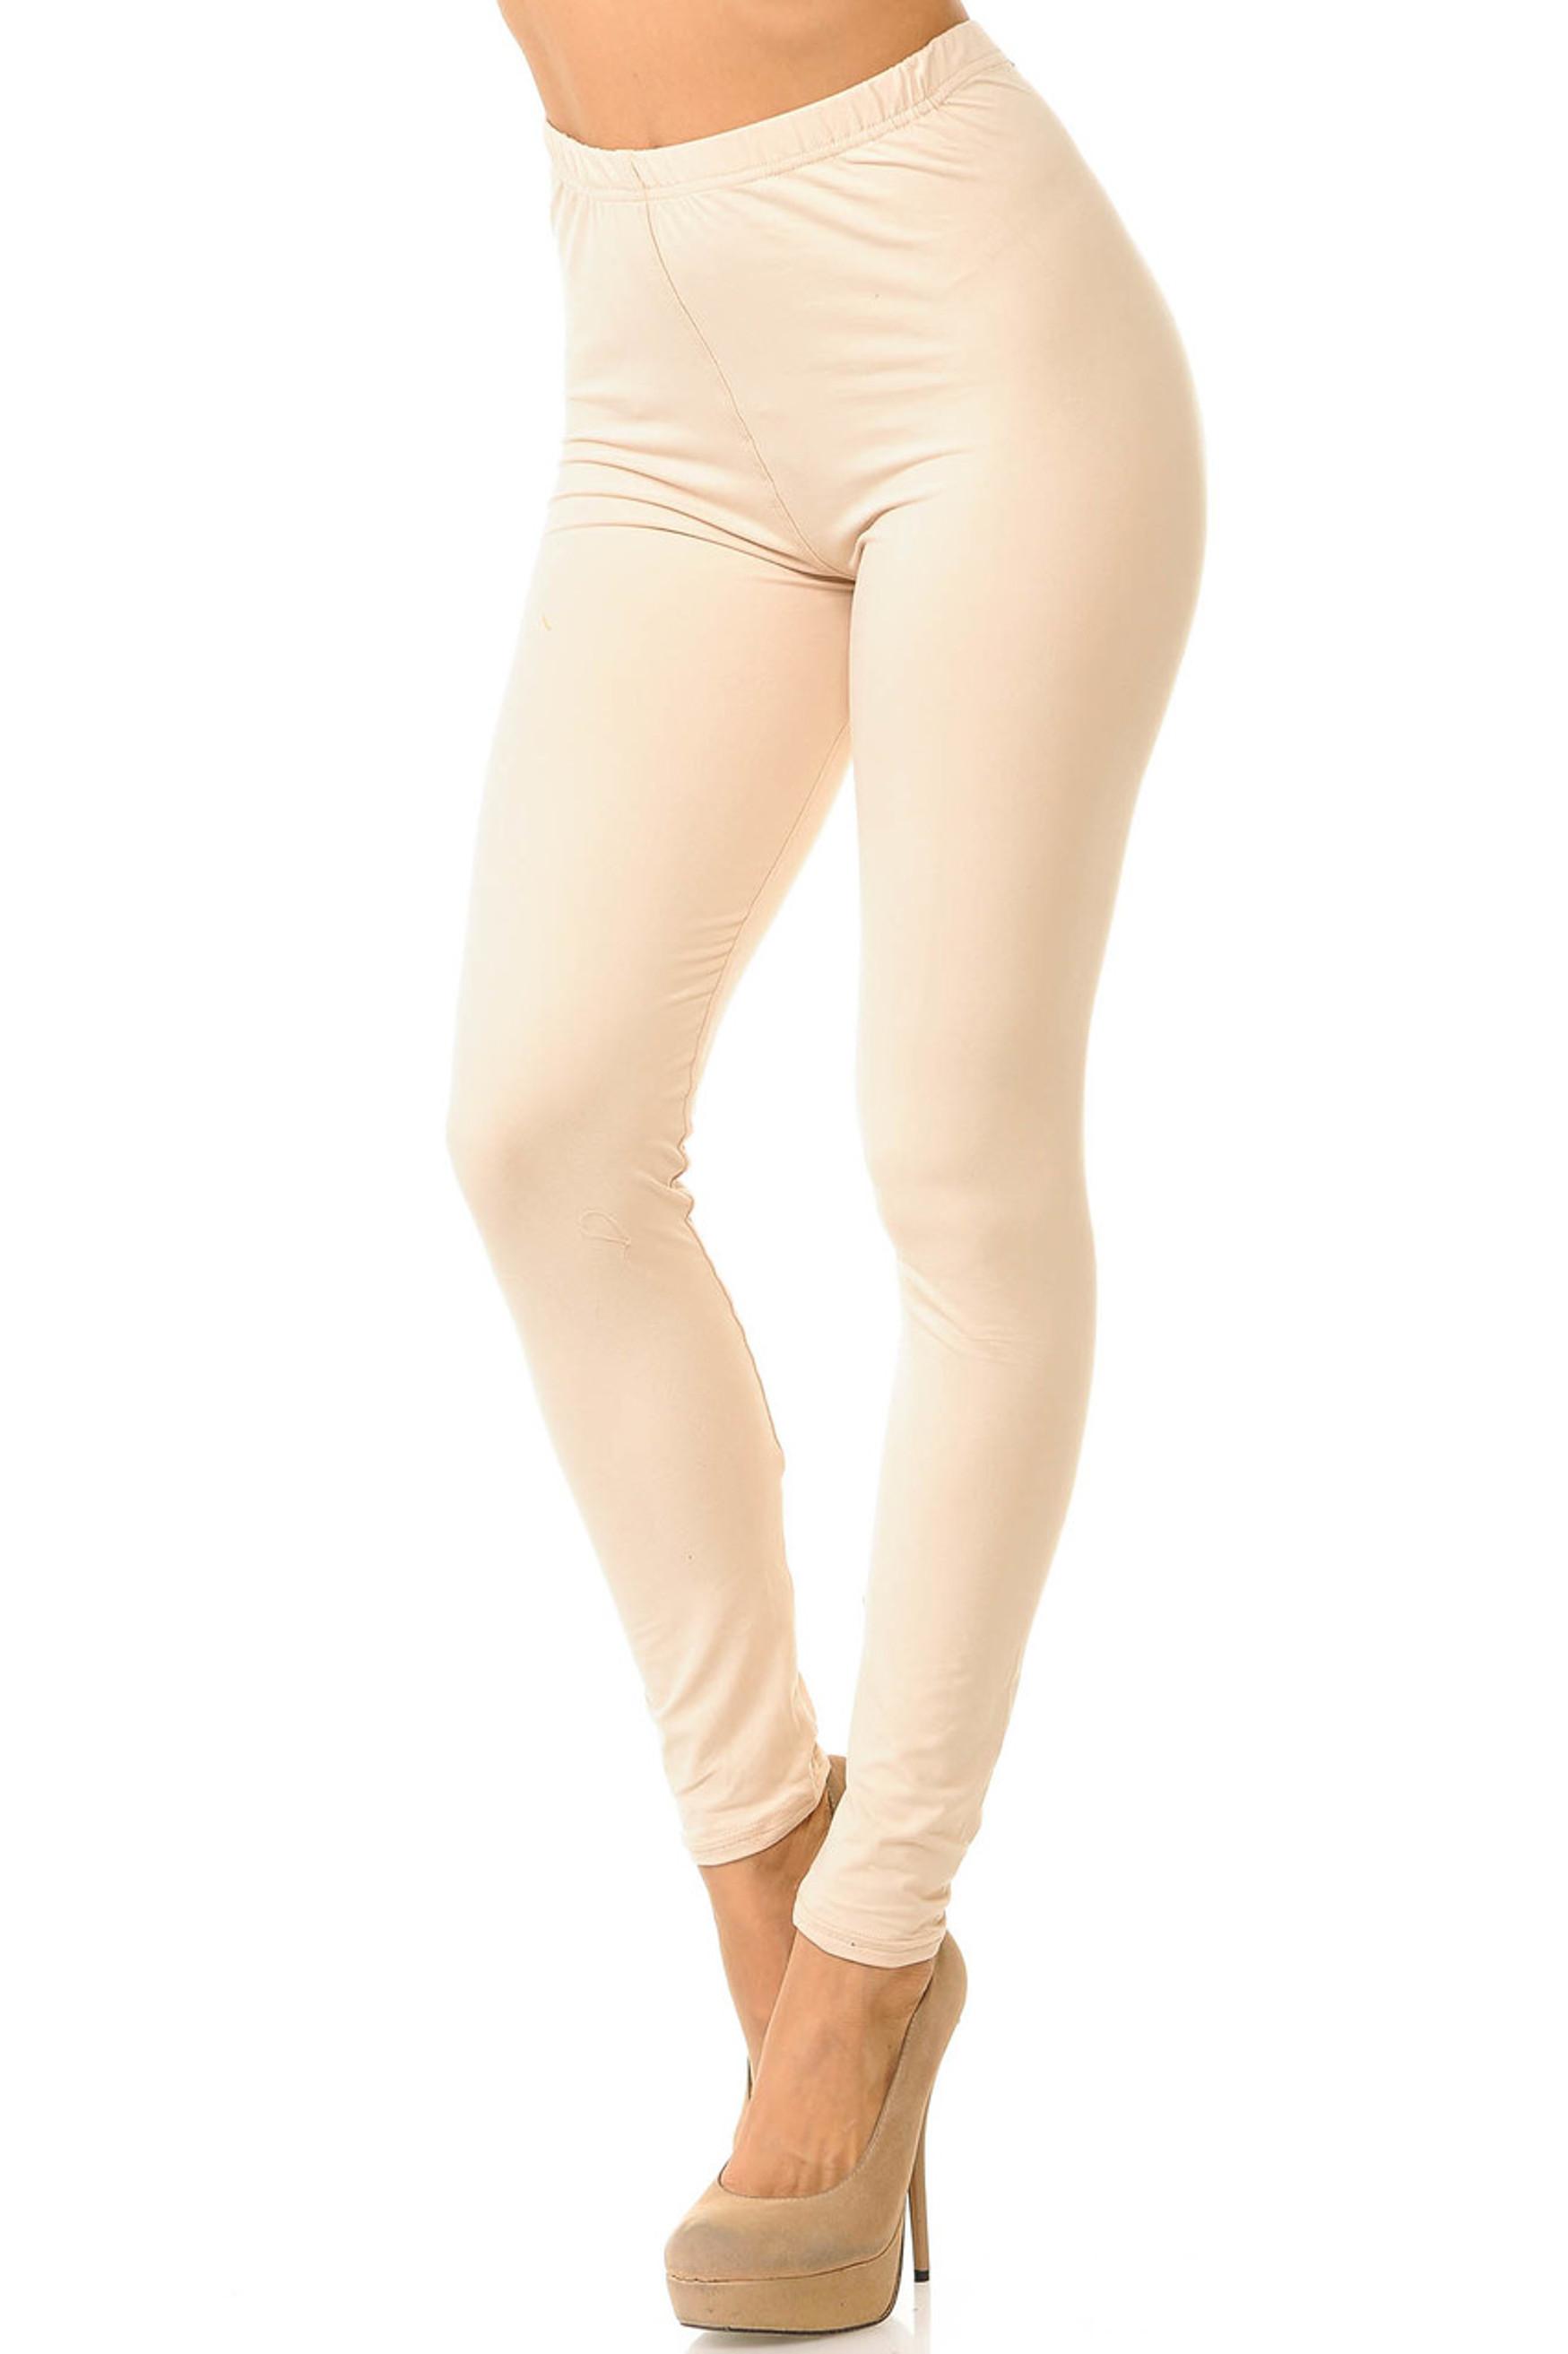 Beige Brushed Basic Solid Leggings - New Mix